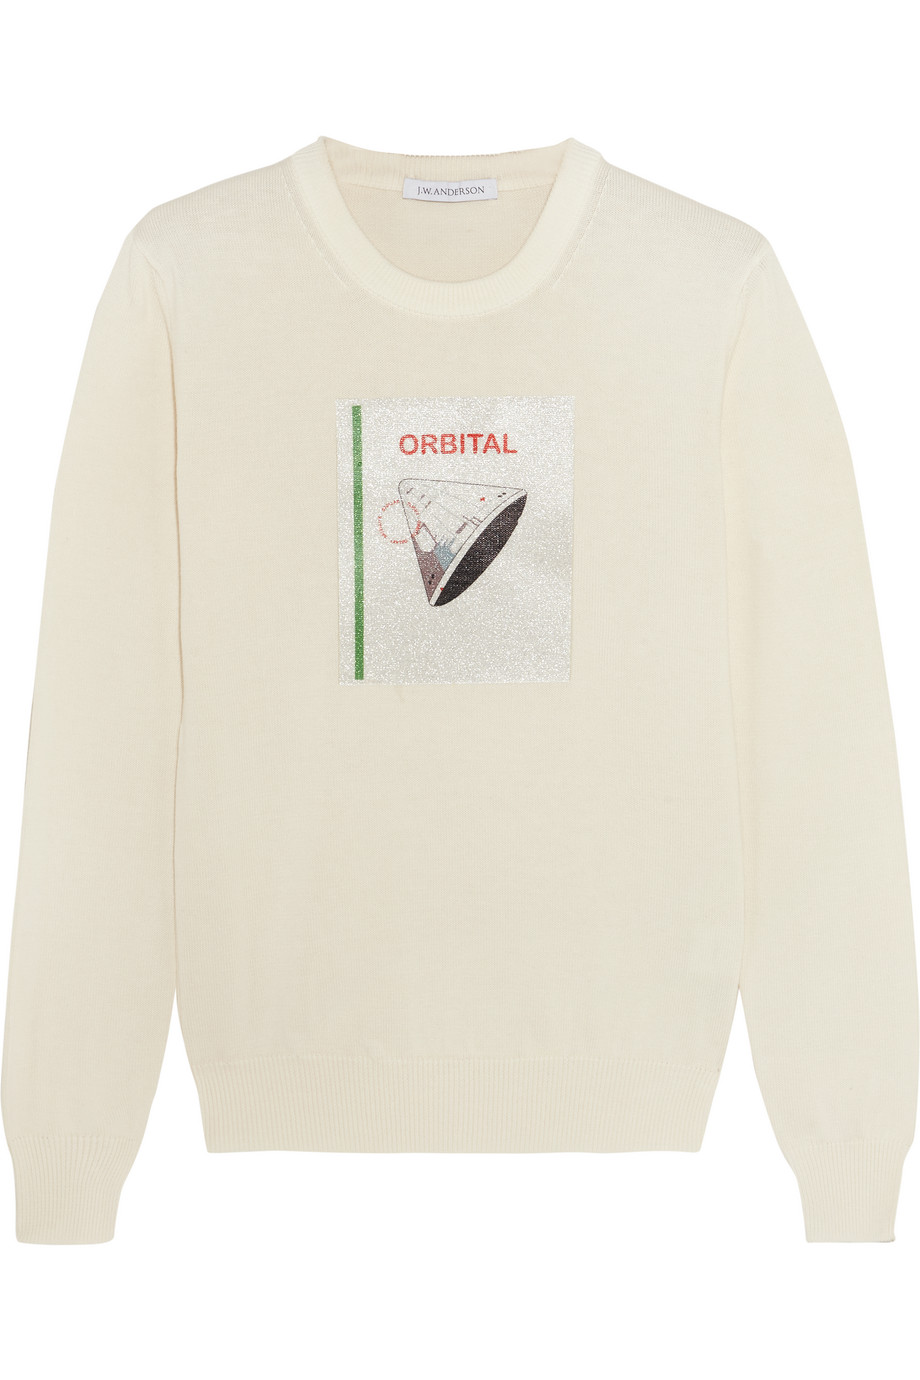 J.W.Anderson Orbital Glittered Printed Cotton Sweater, Cream, Women's, Size: M